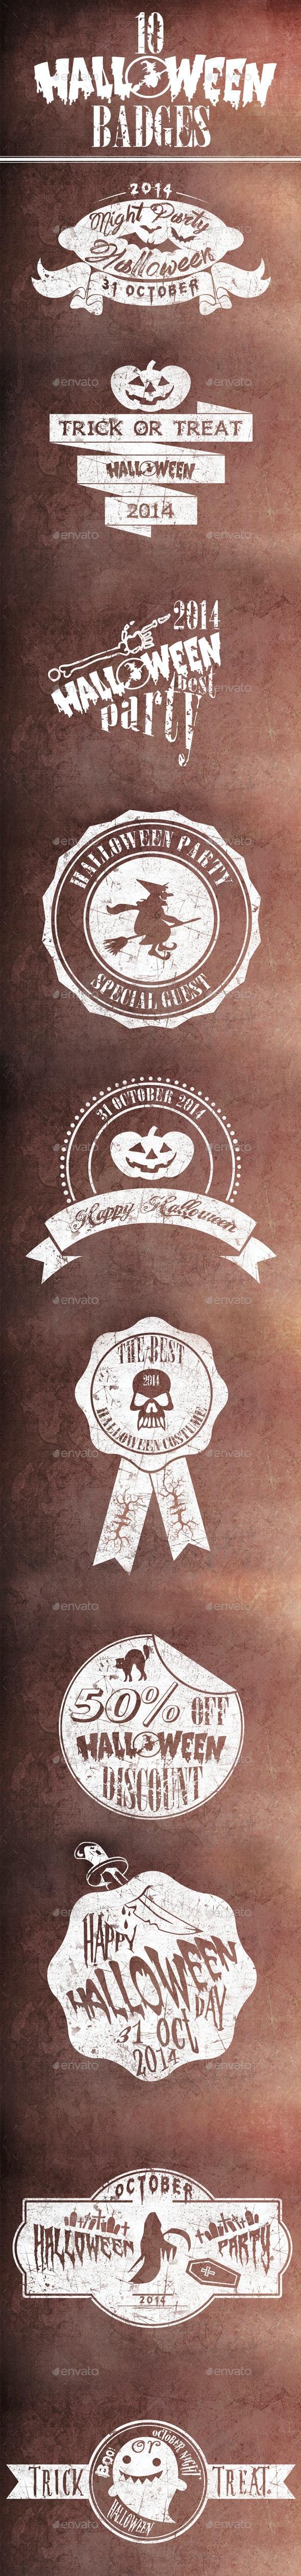 10 Halloween Badges - Badges & Stickers Web Elements